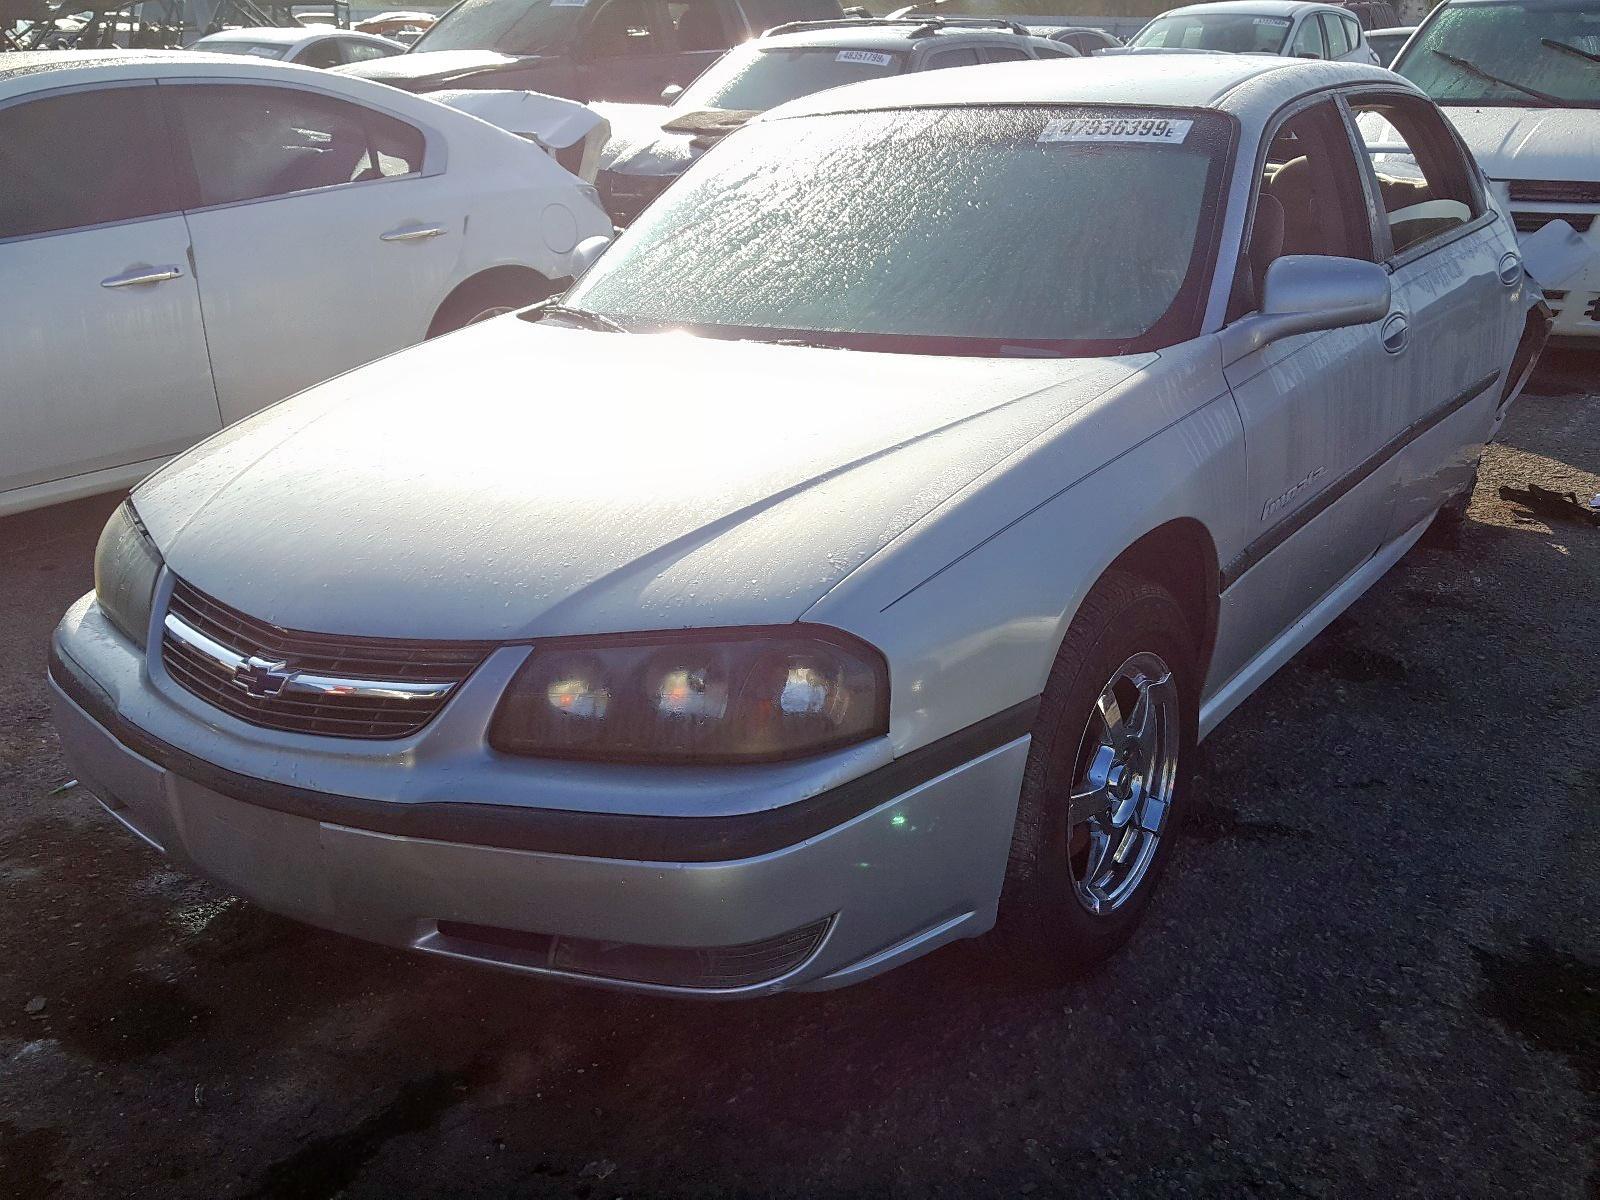 2000 Chevrolet Impala Ls 3.8L Right View